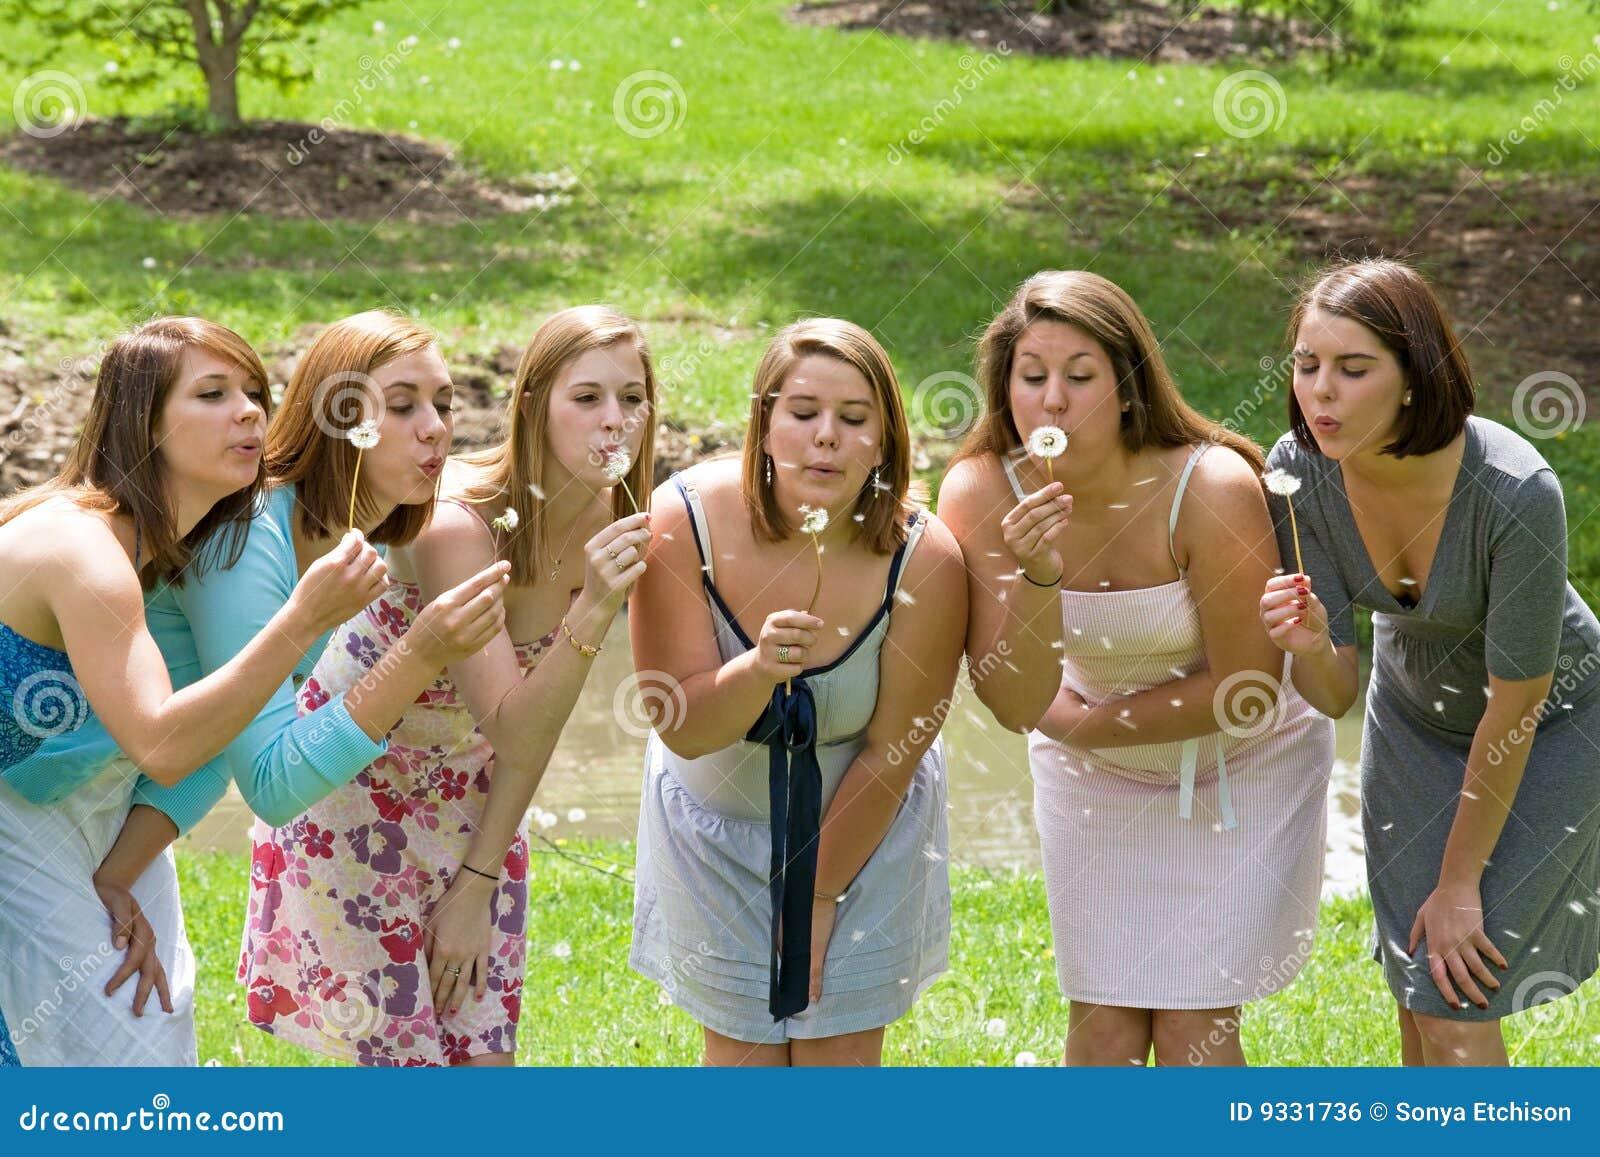 college women group sesx videos